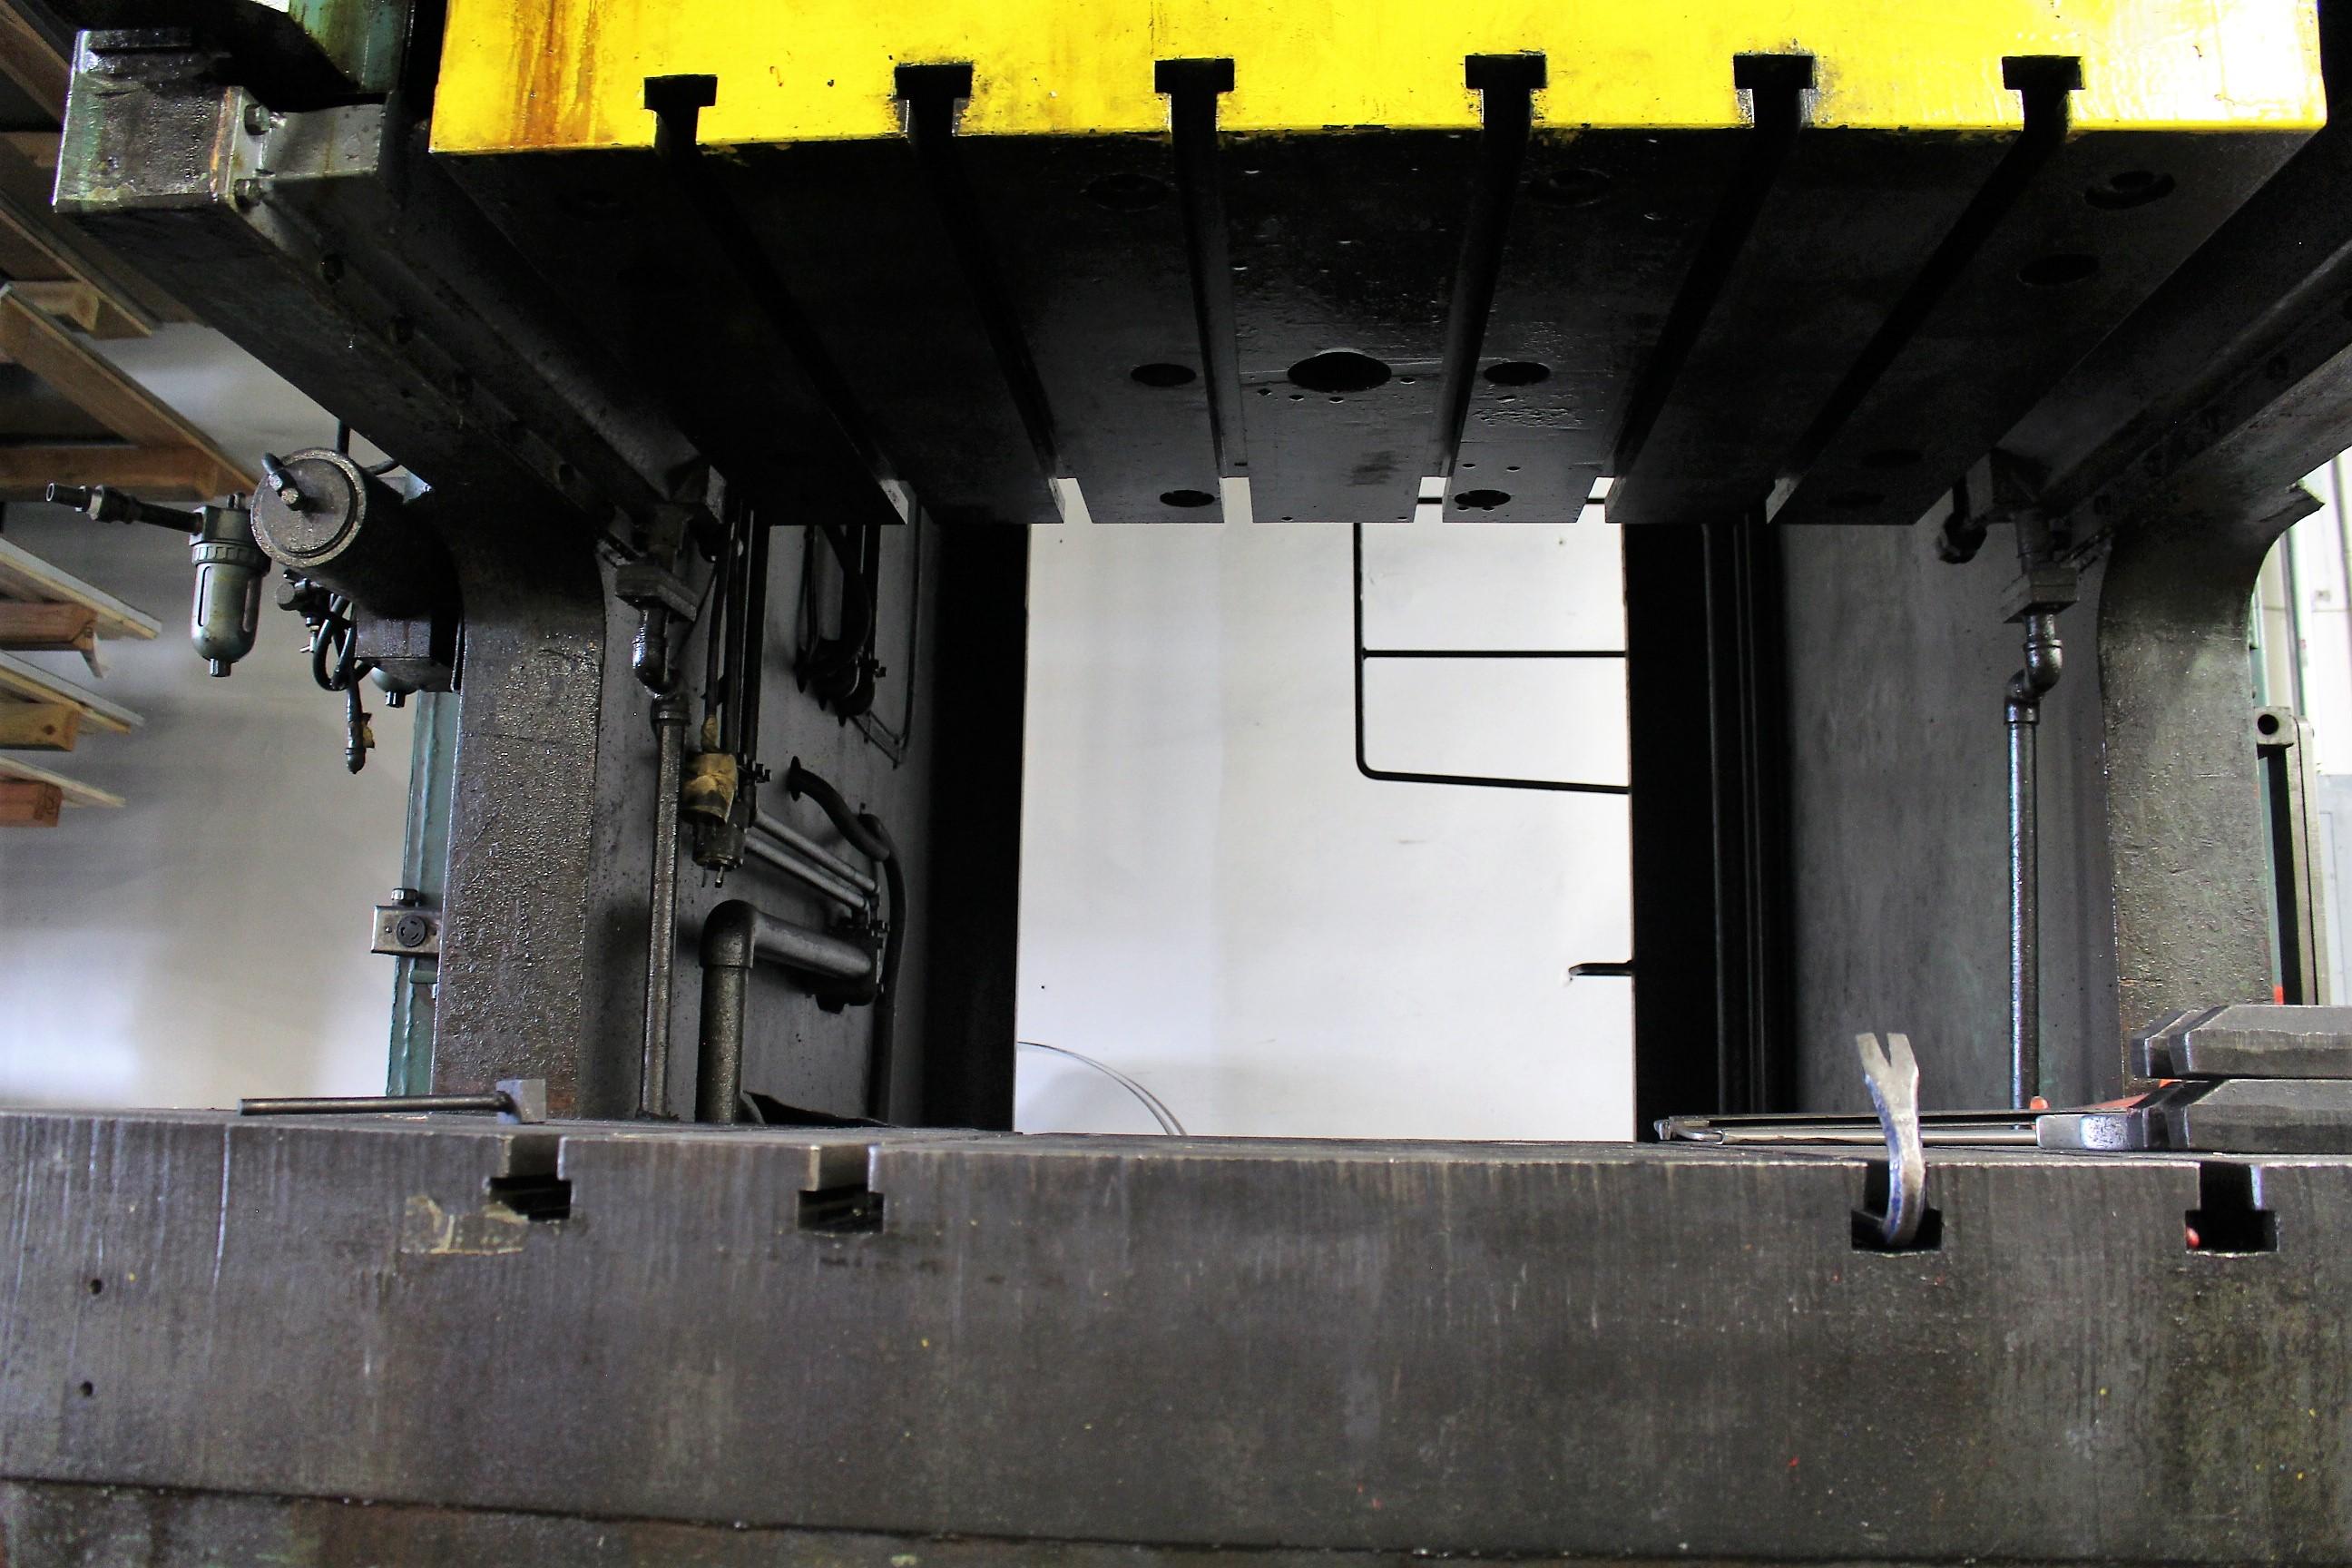 "AIDA MODEL PC-30 PUNCH PRESS, 300 TON CAPACITY,AIR CUSHION, 15.7"" STROKE, 30 SPM, 70"" X 30"" - Image 14 of 21"